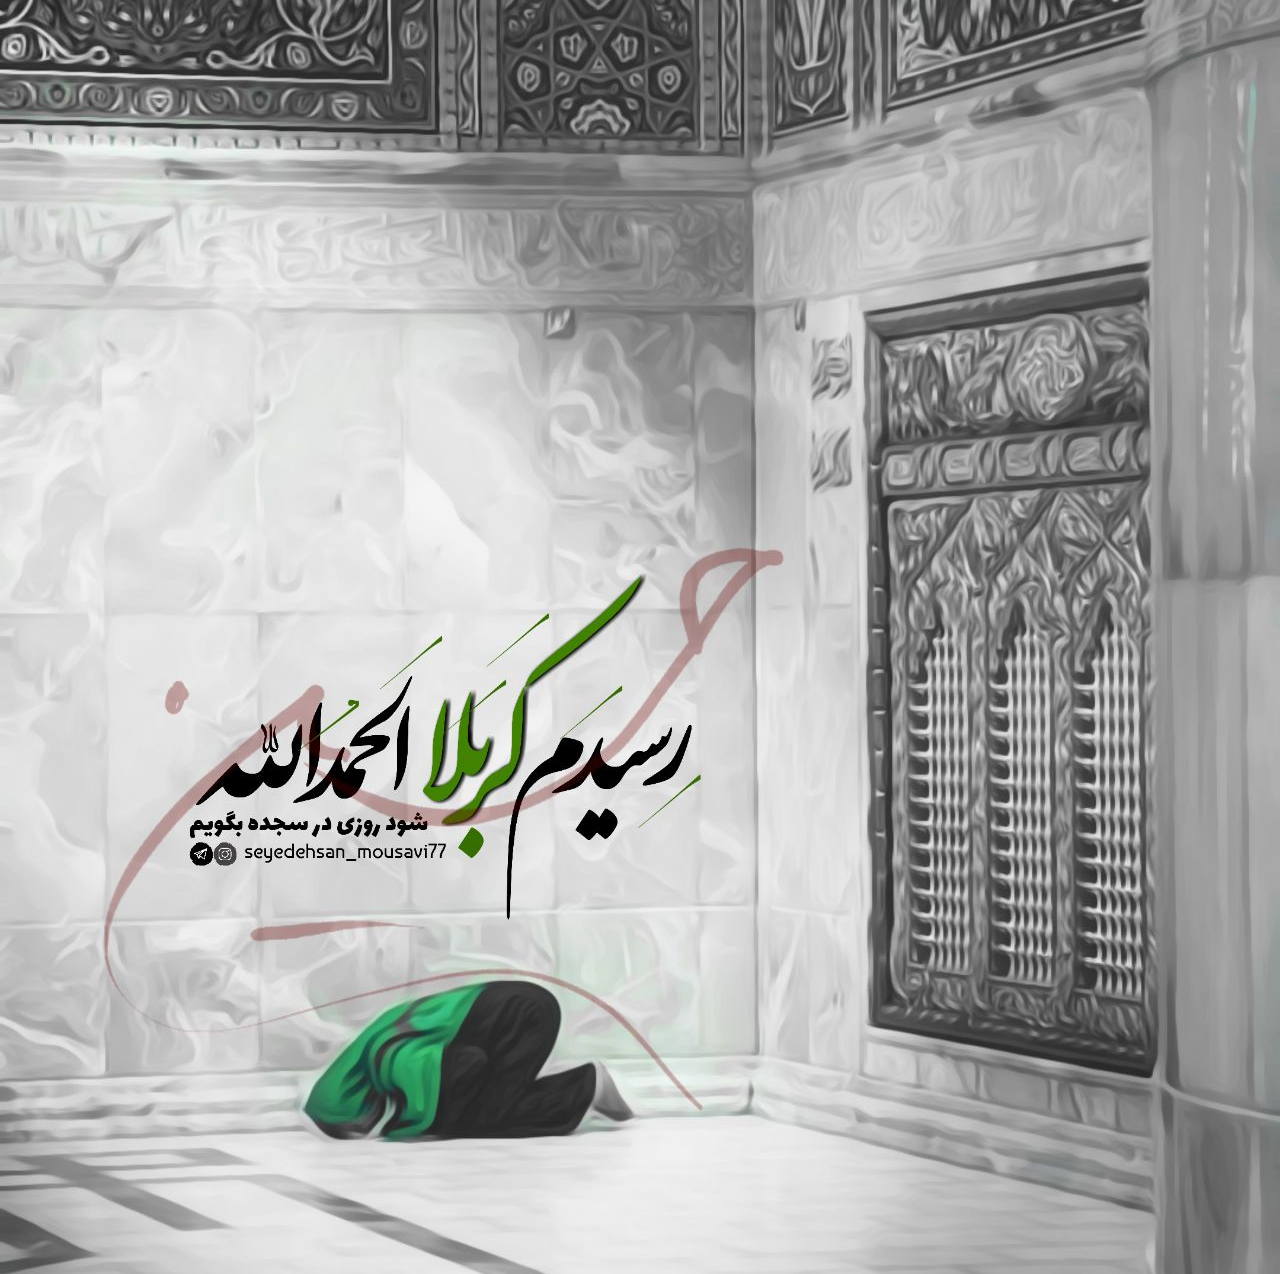 برترینها متن نگار Ehsan mousavi